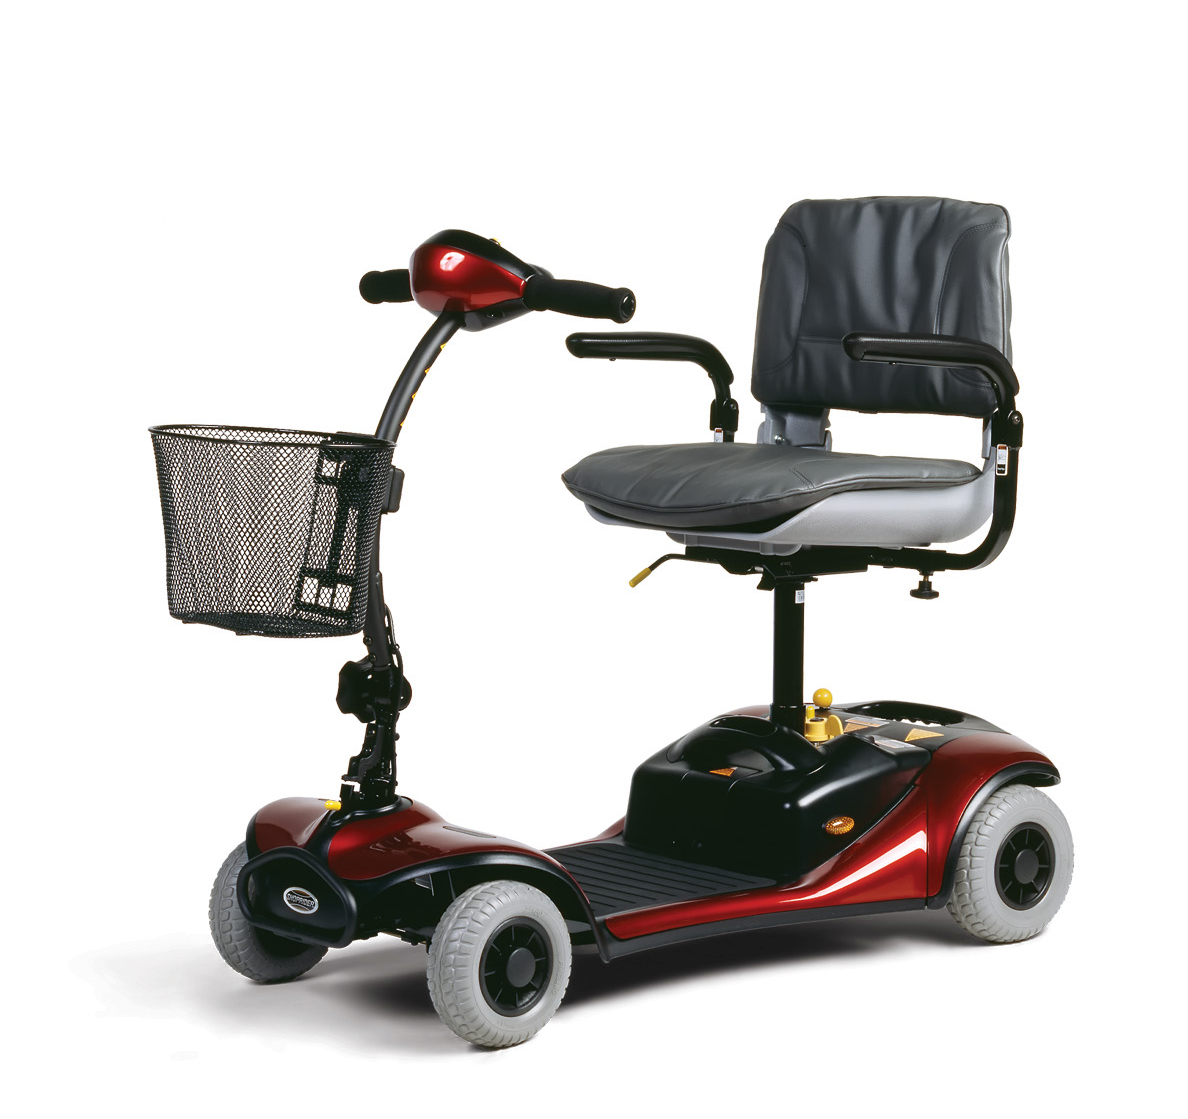 Shoprider GK-8 Chameleon mobility scooter